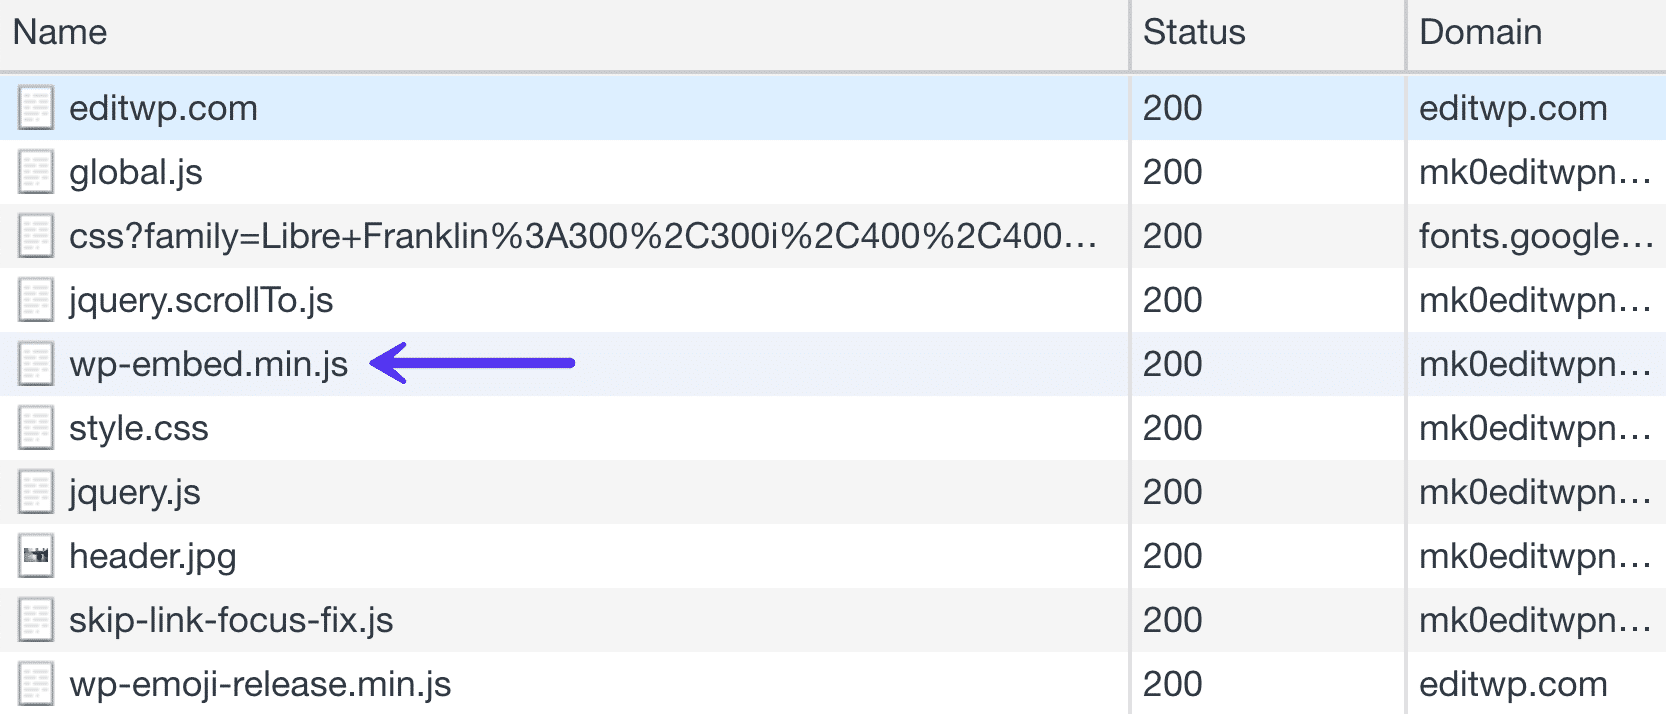 wp-embed.min.js fichier